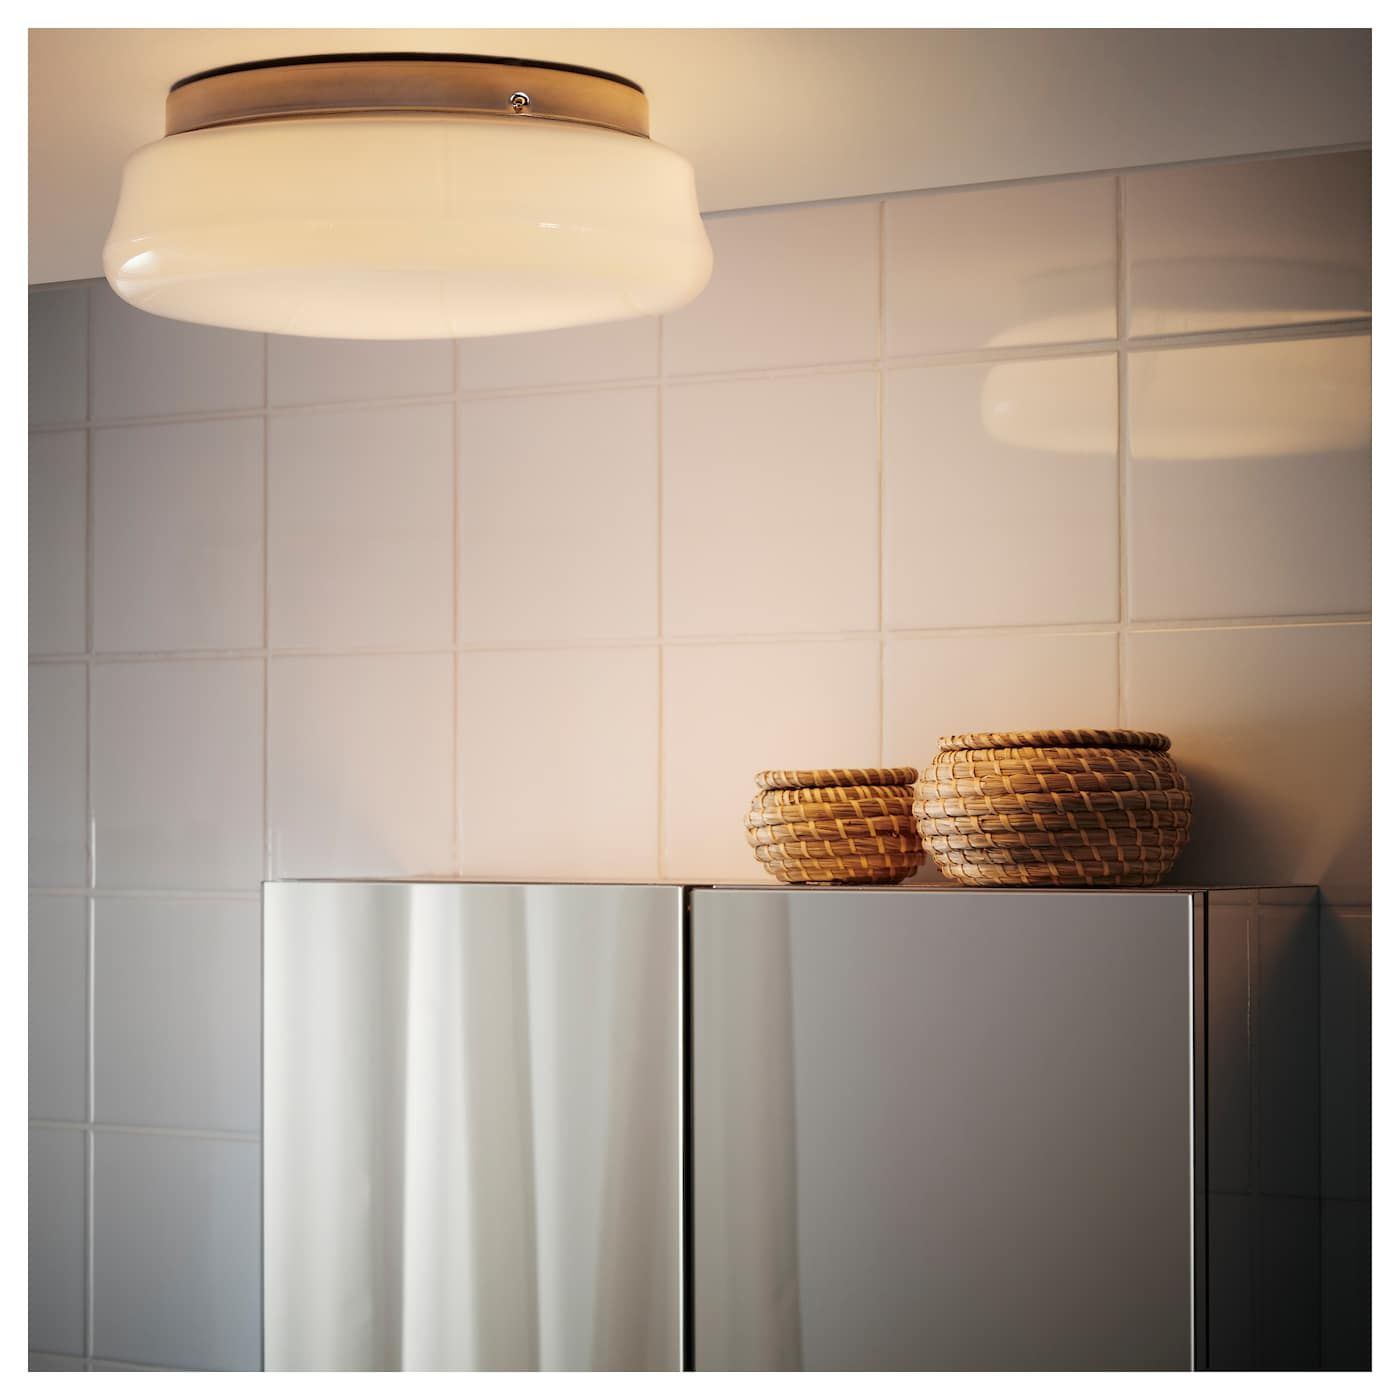 Nabytek A Vybaveni Pro Domacnosti A Kancelare Deckenlampe Ikea